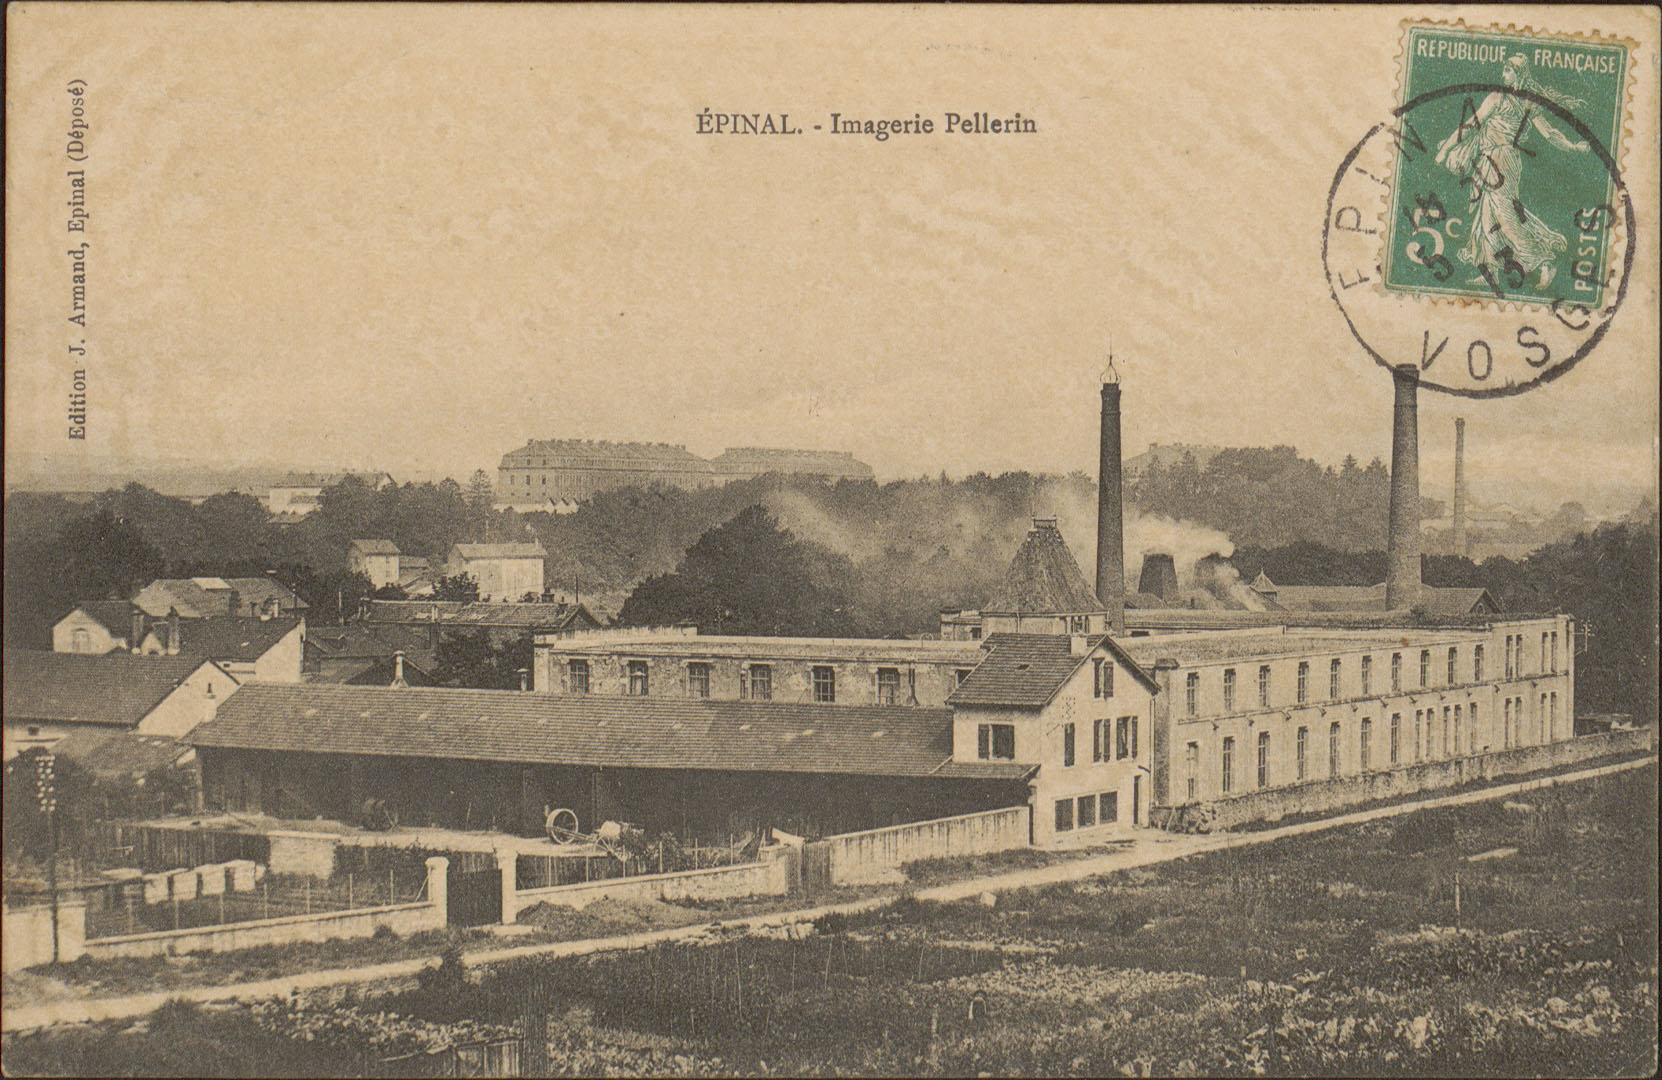 Contenu du Épinal, Imagerie Pellerin